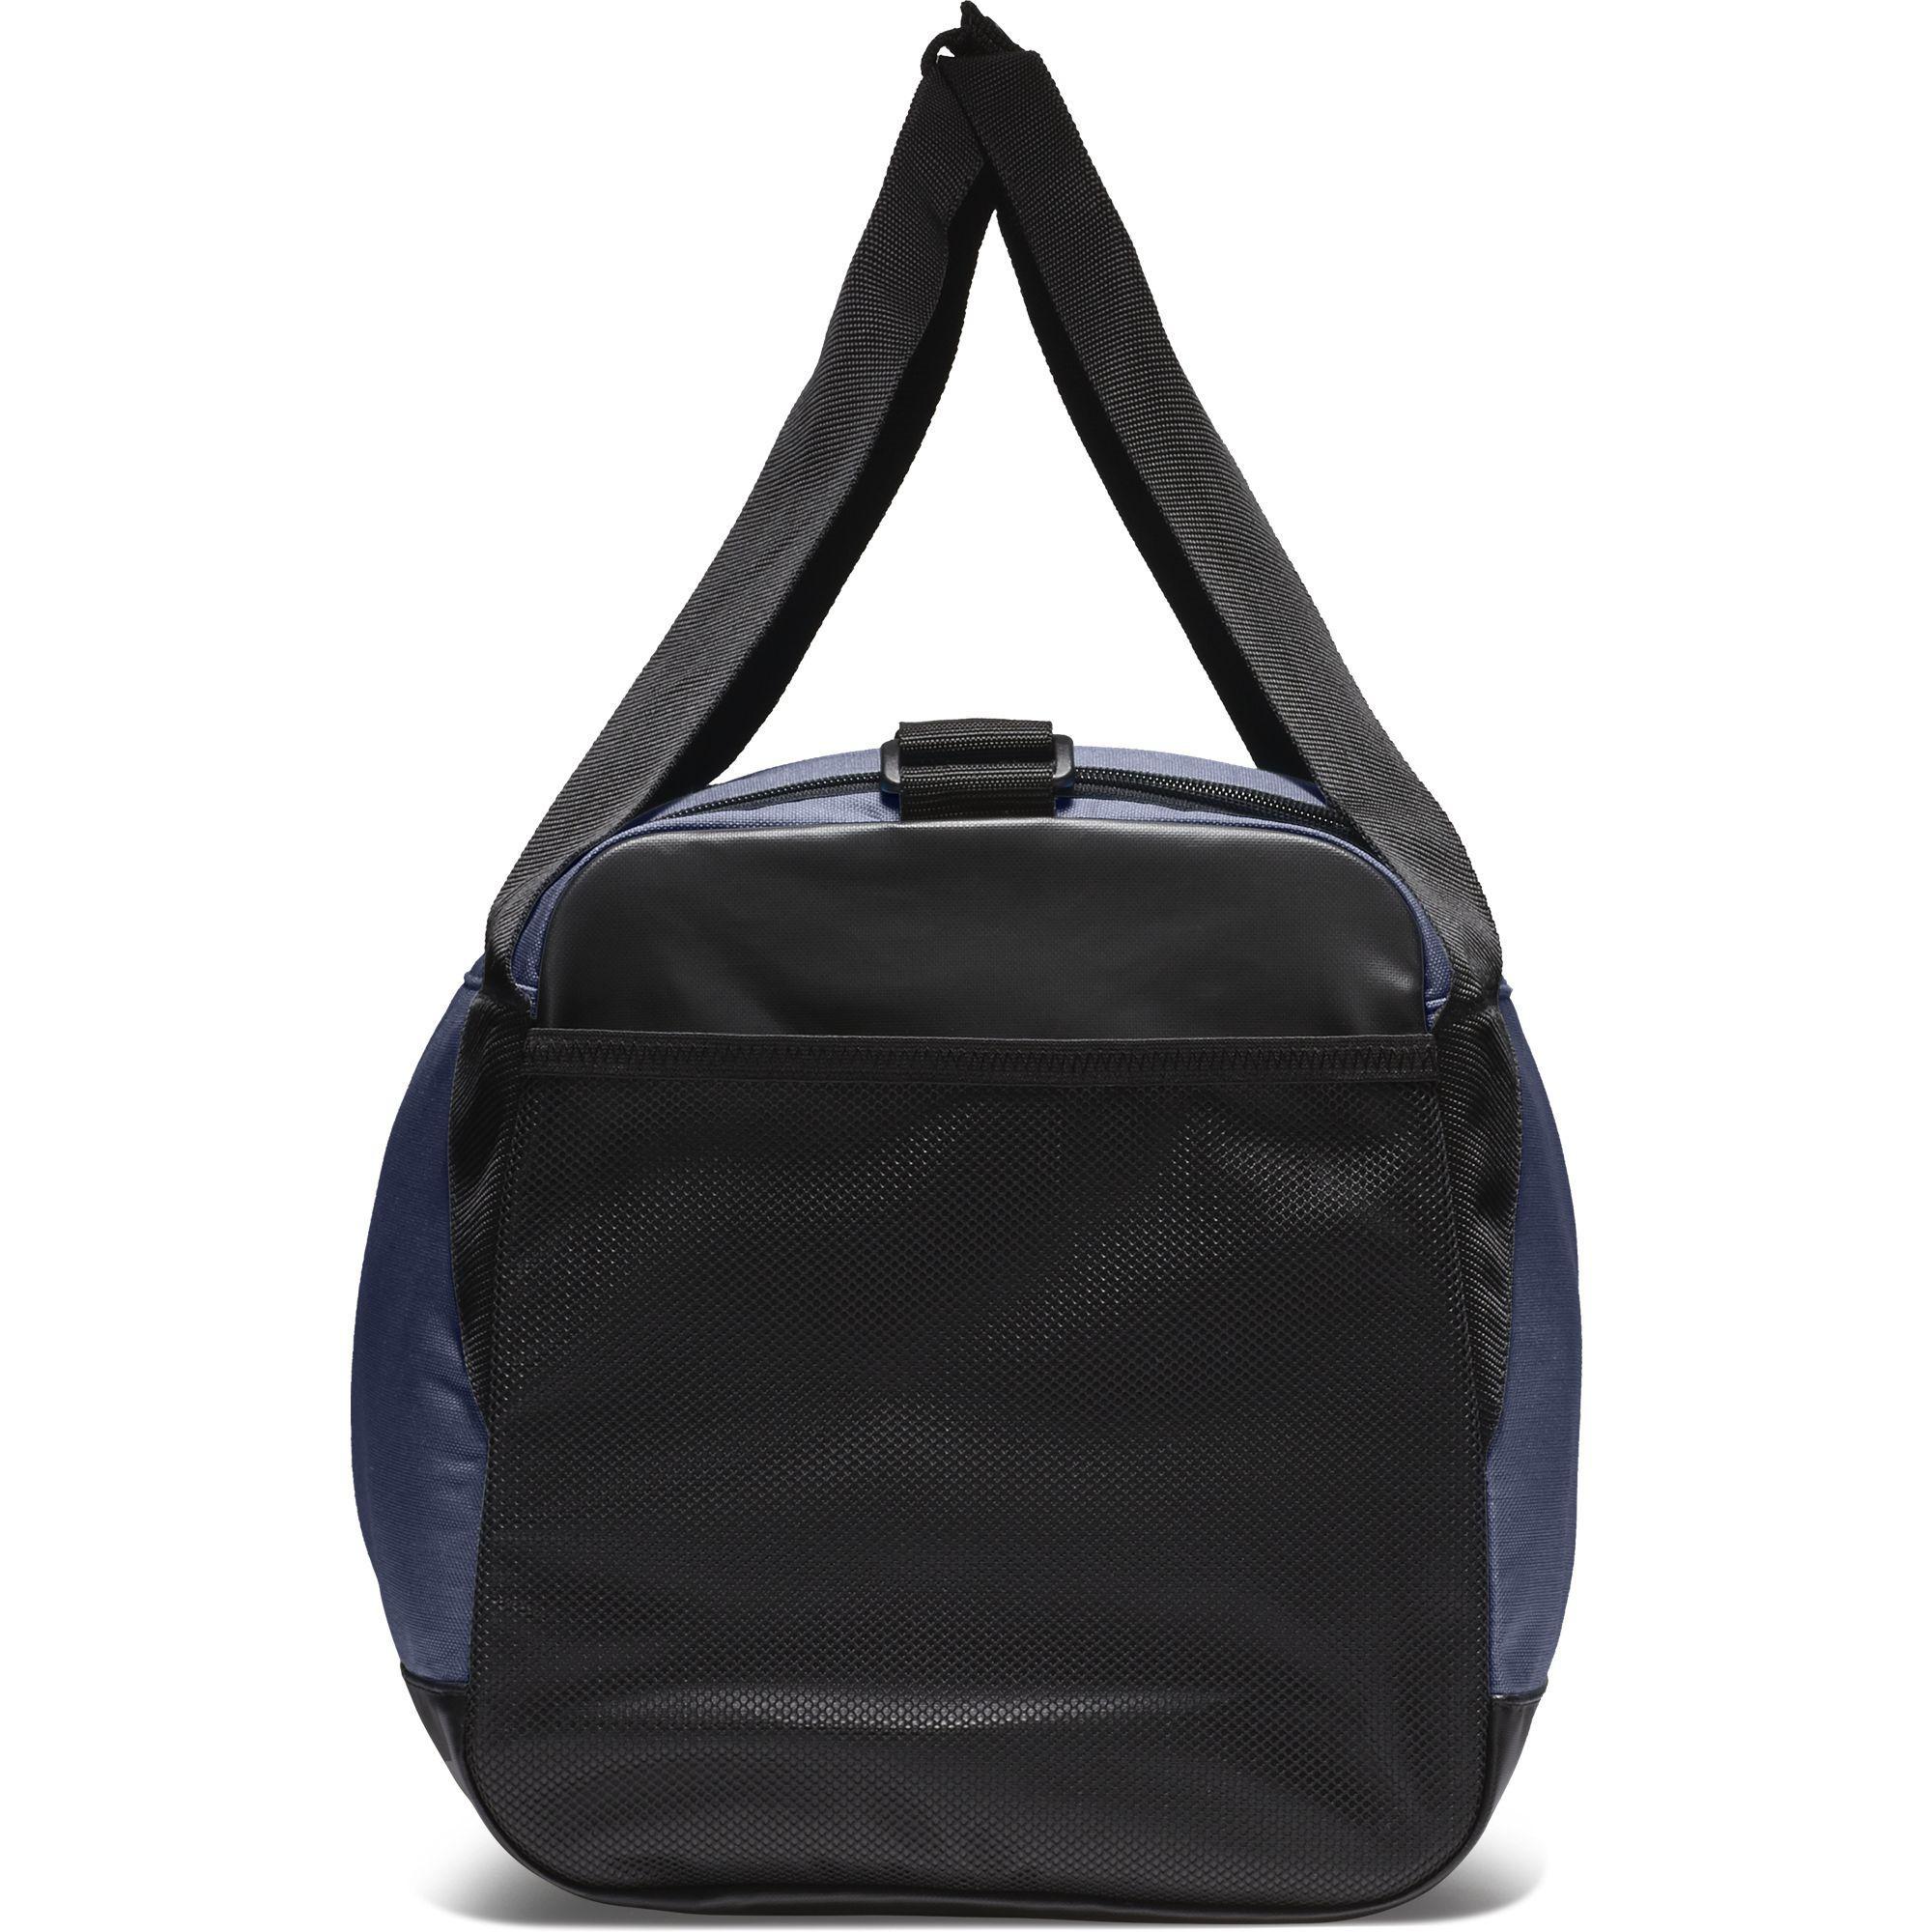 Nike Brasilia Small Training Duffel Bag - Midnight Navy Black White ... a01ddf2aa39ba